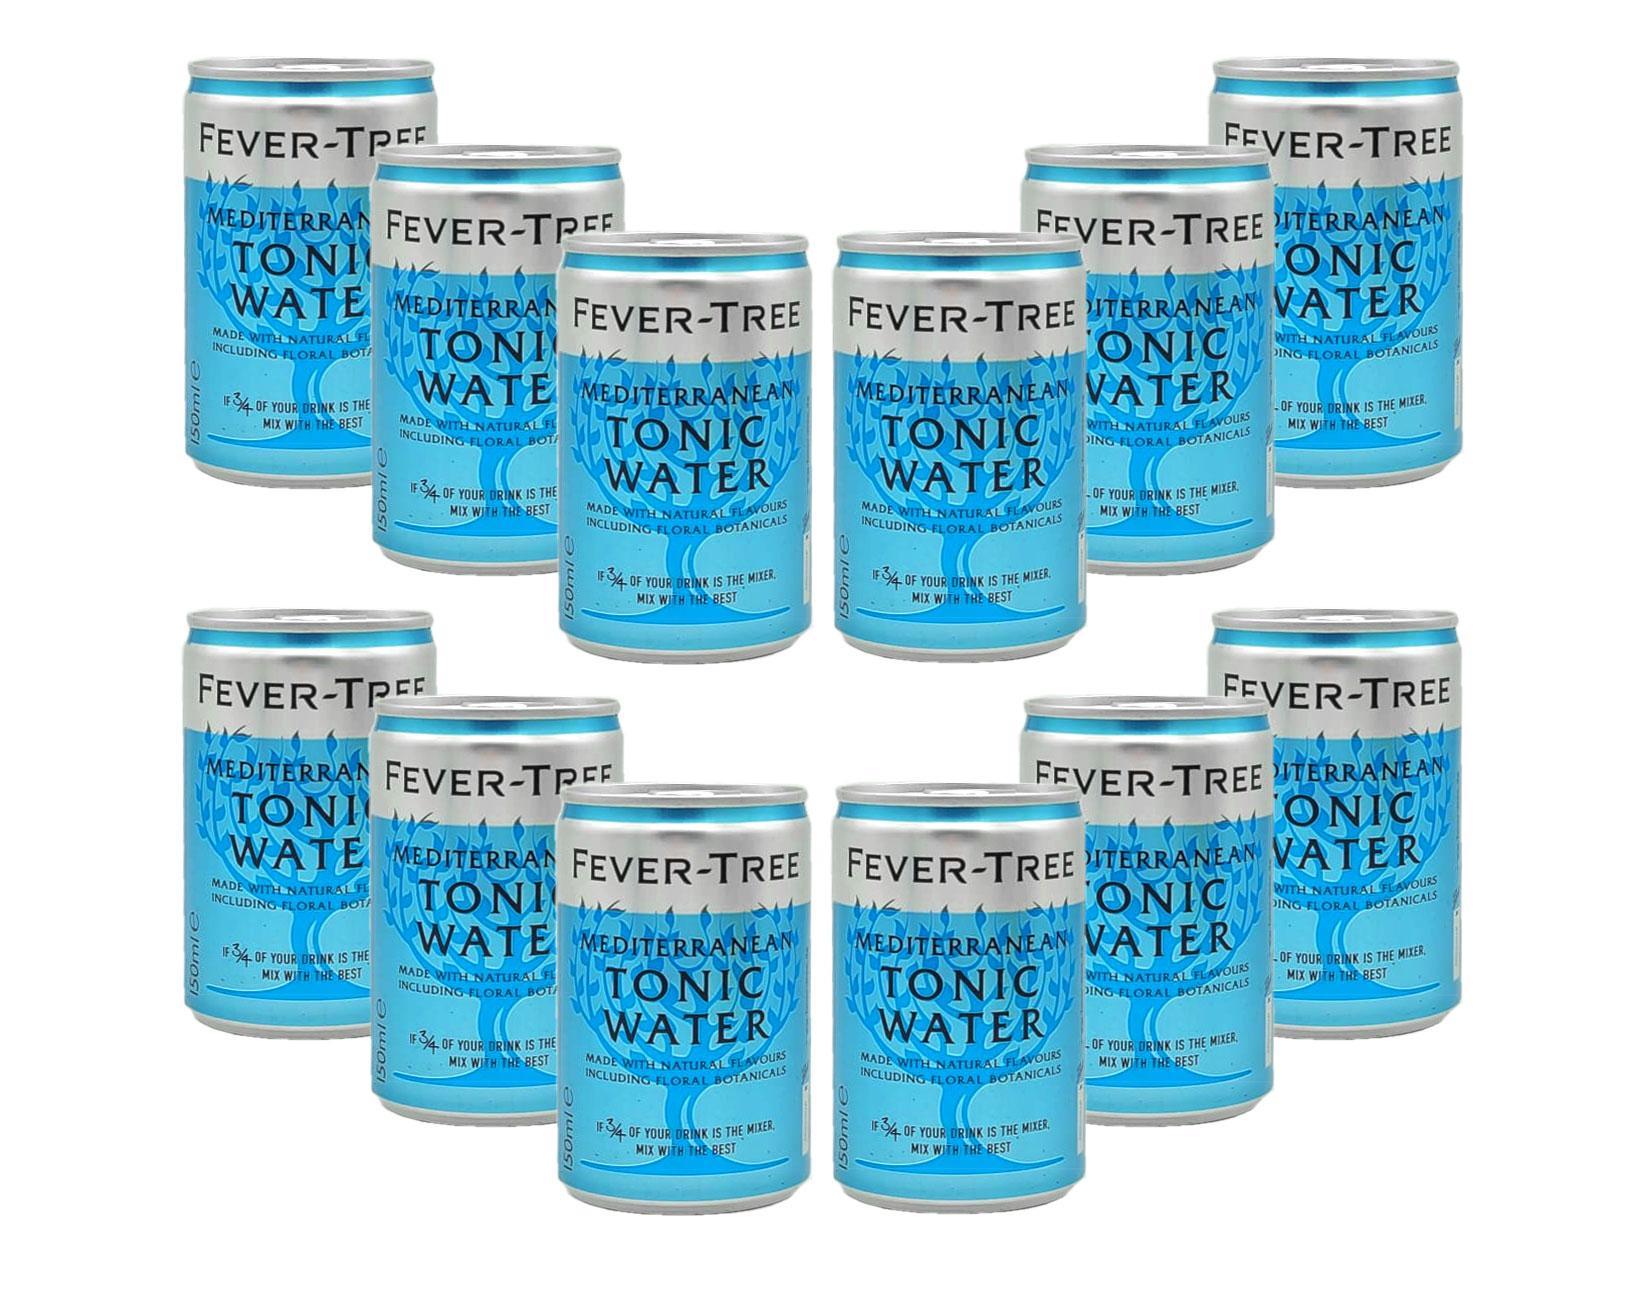 Fever Tree 12er Set Mediterranean Tonic Water 12x 150ml Dose inkl. Pfand EINWEG